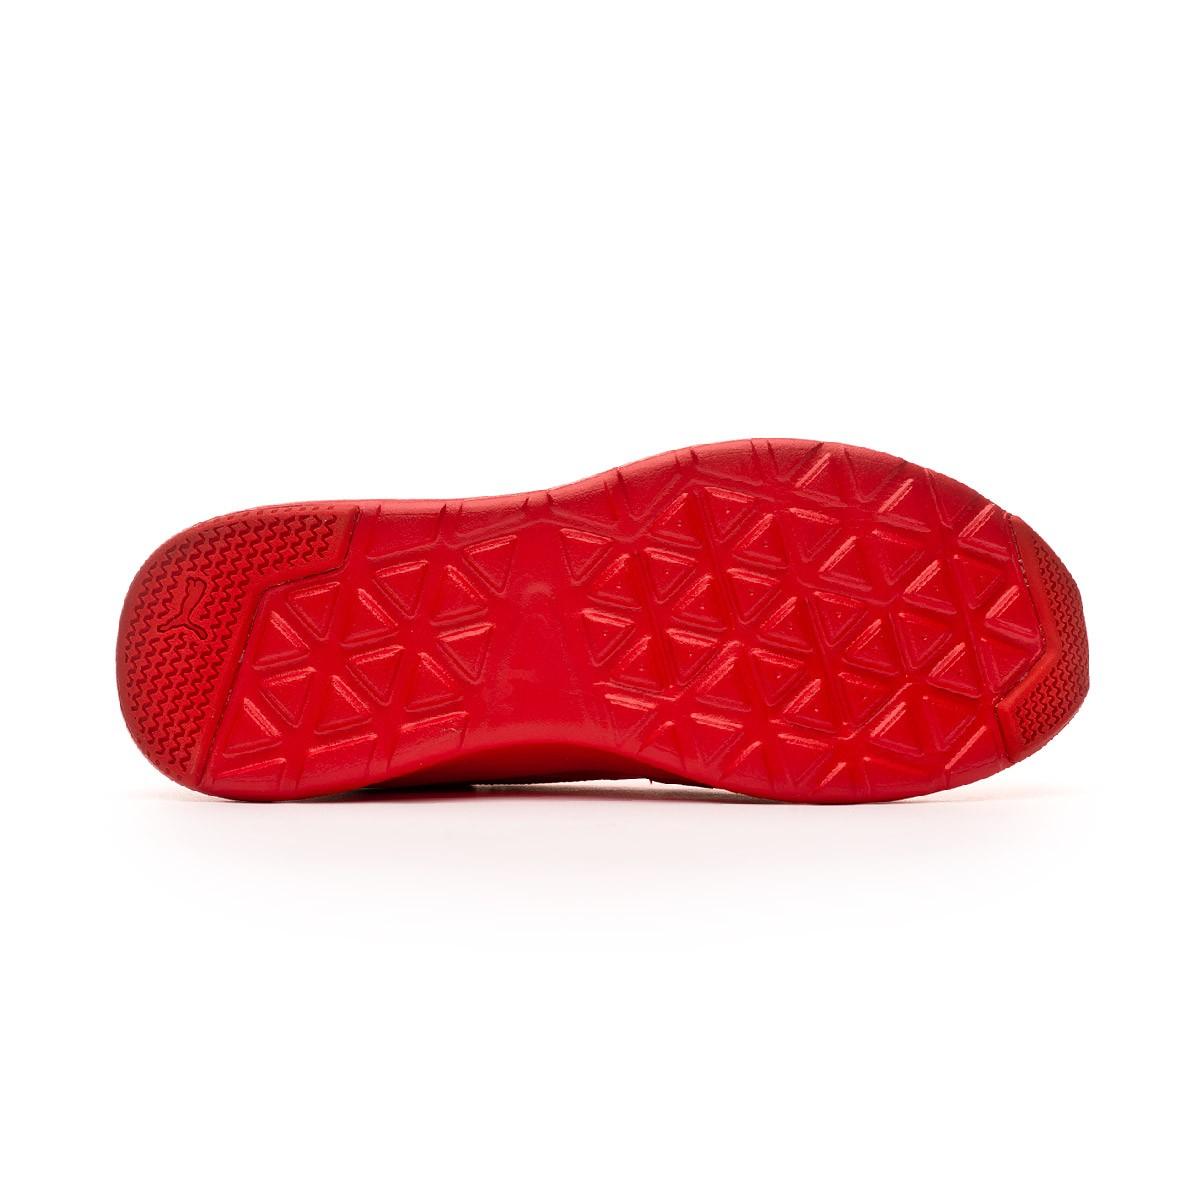 Zapatilla Wired Pro High risk red Asphalt